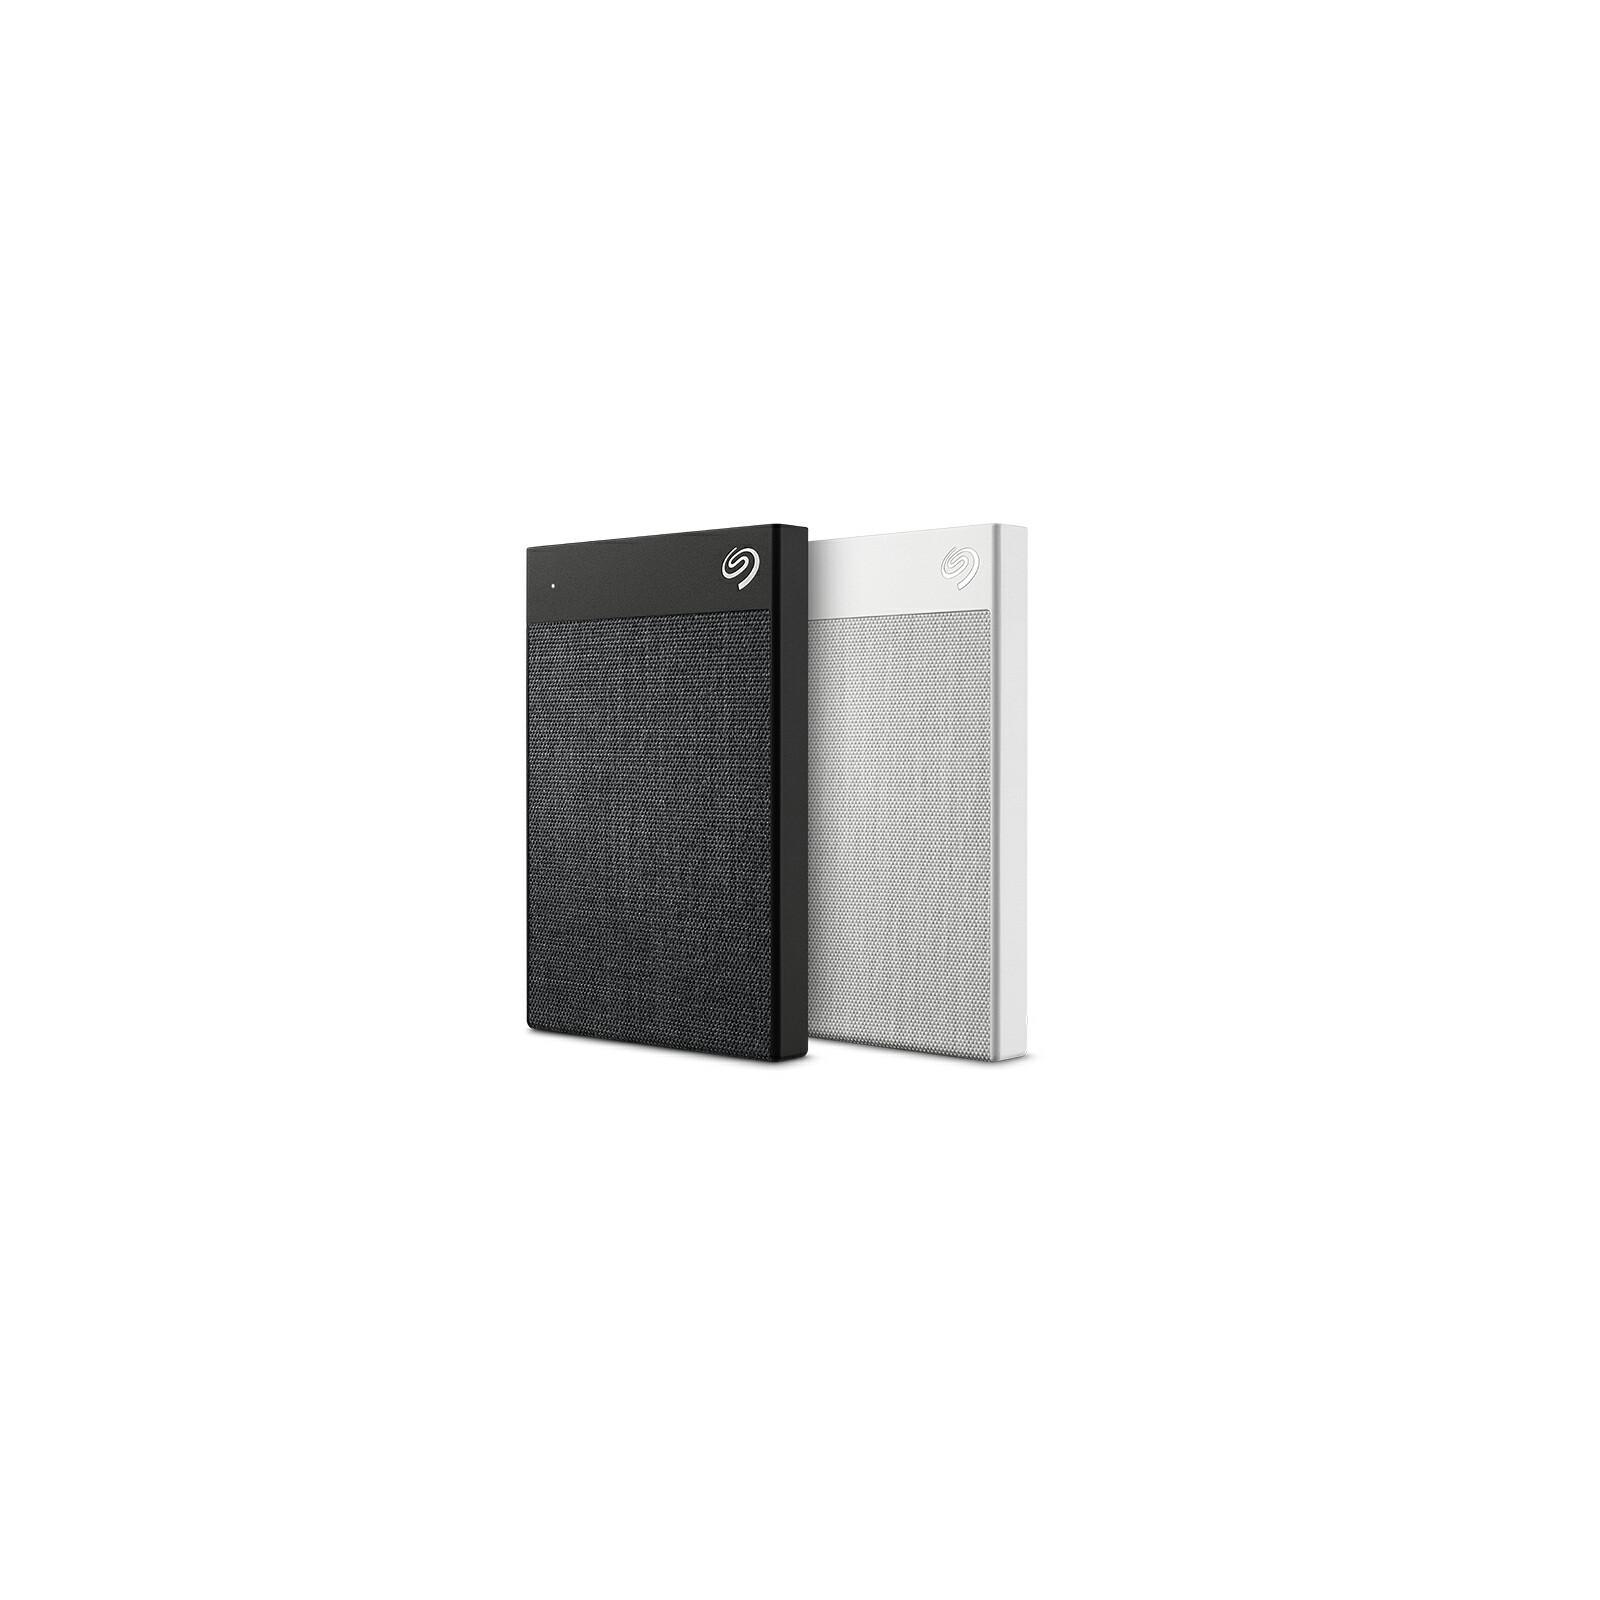 Seagate HDD Backup Ultra 1TB schwarz